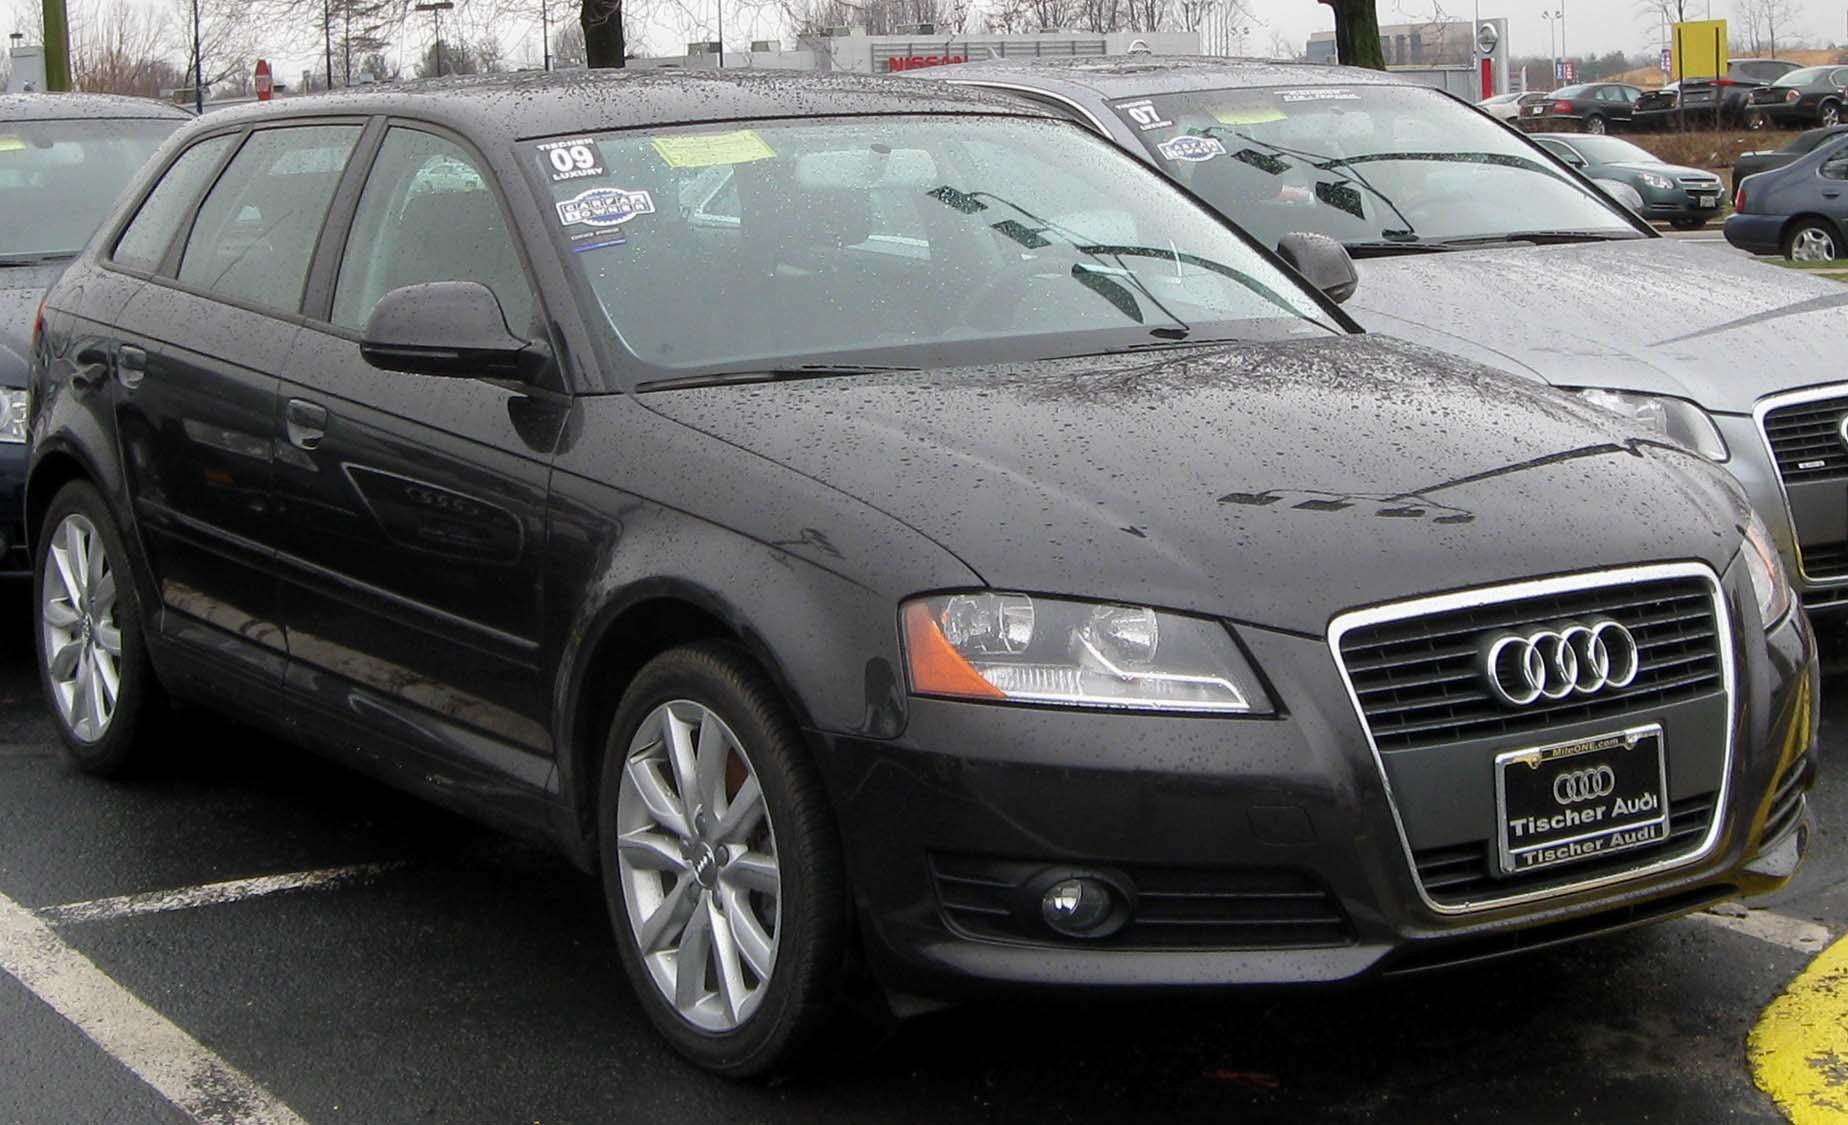 File:2009 Audi A3 -- 03-14-2010.jpg